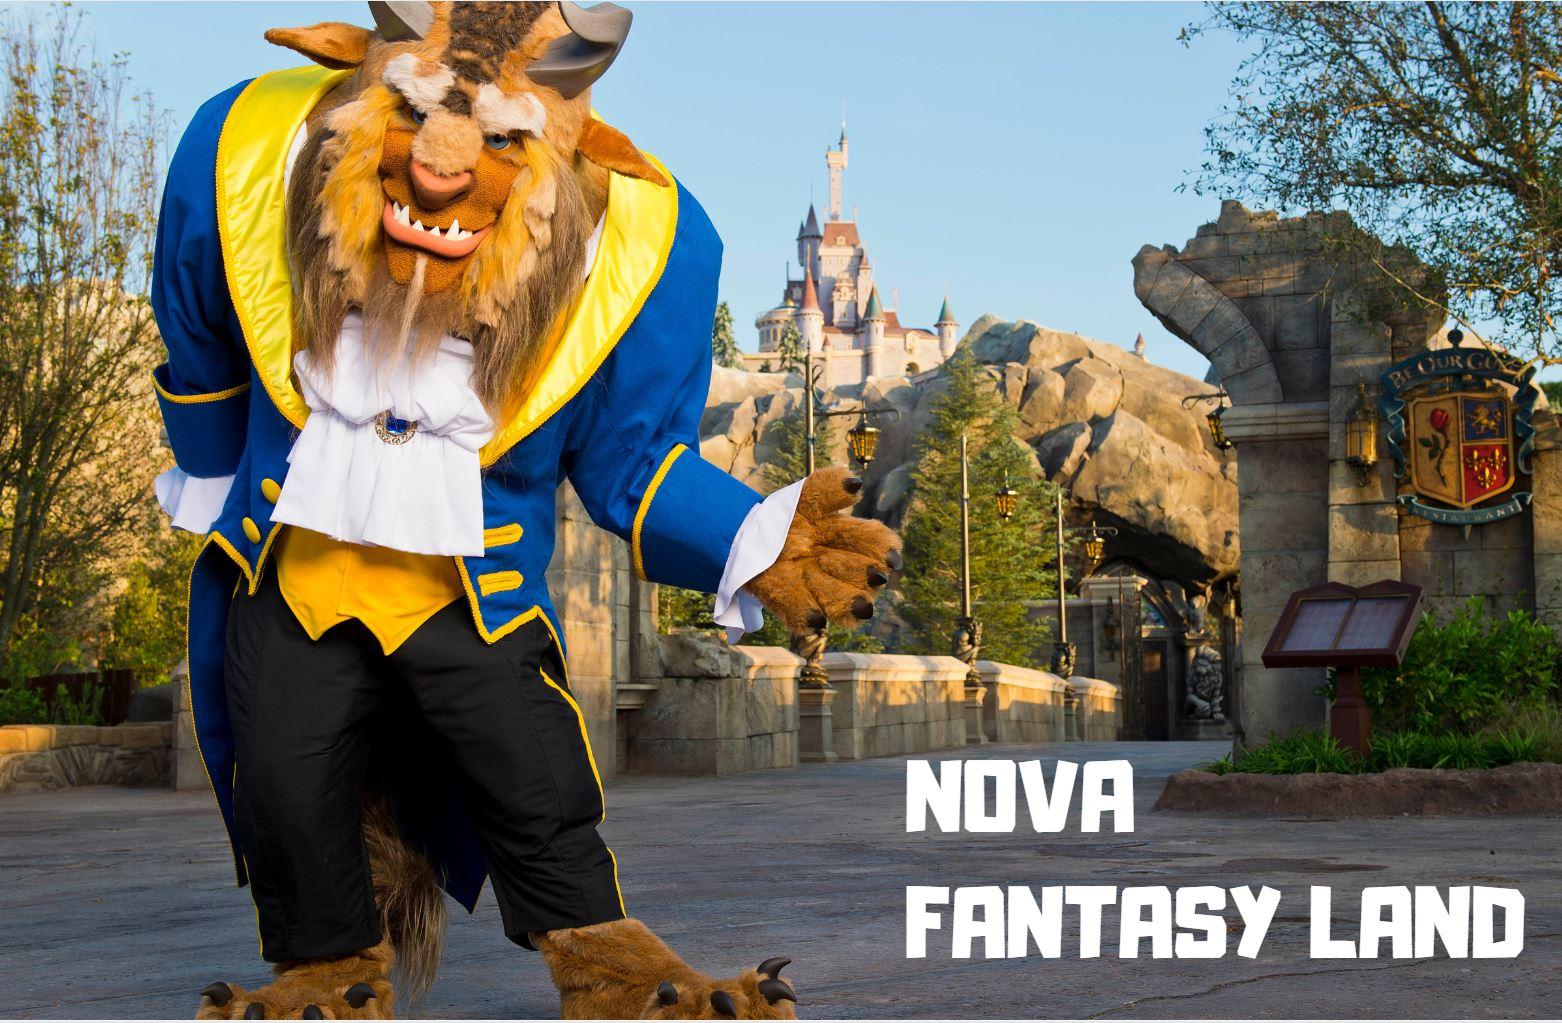 nova fantasy land mk - Nova Fantasy Land - Novidades no Magic Kingdom